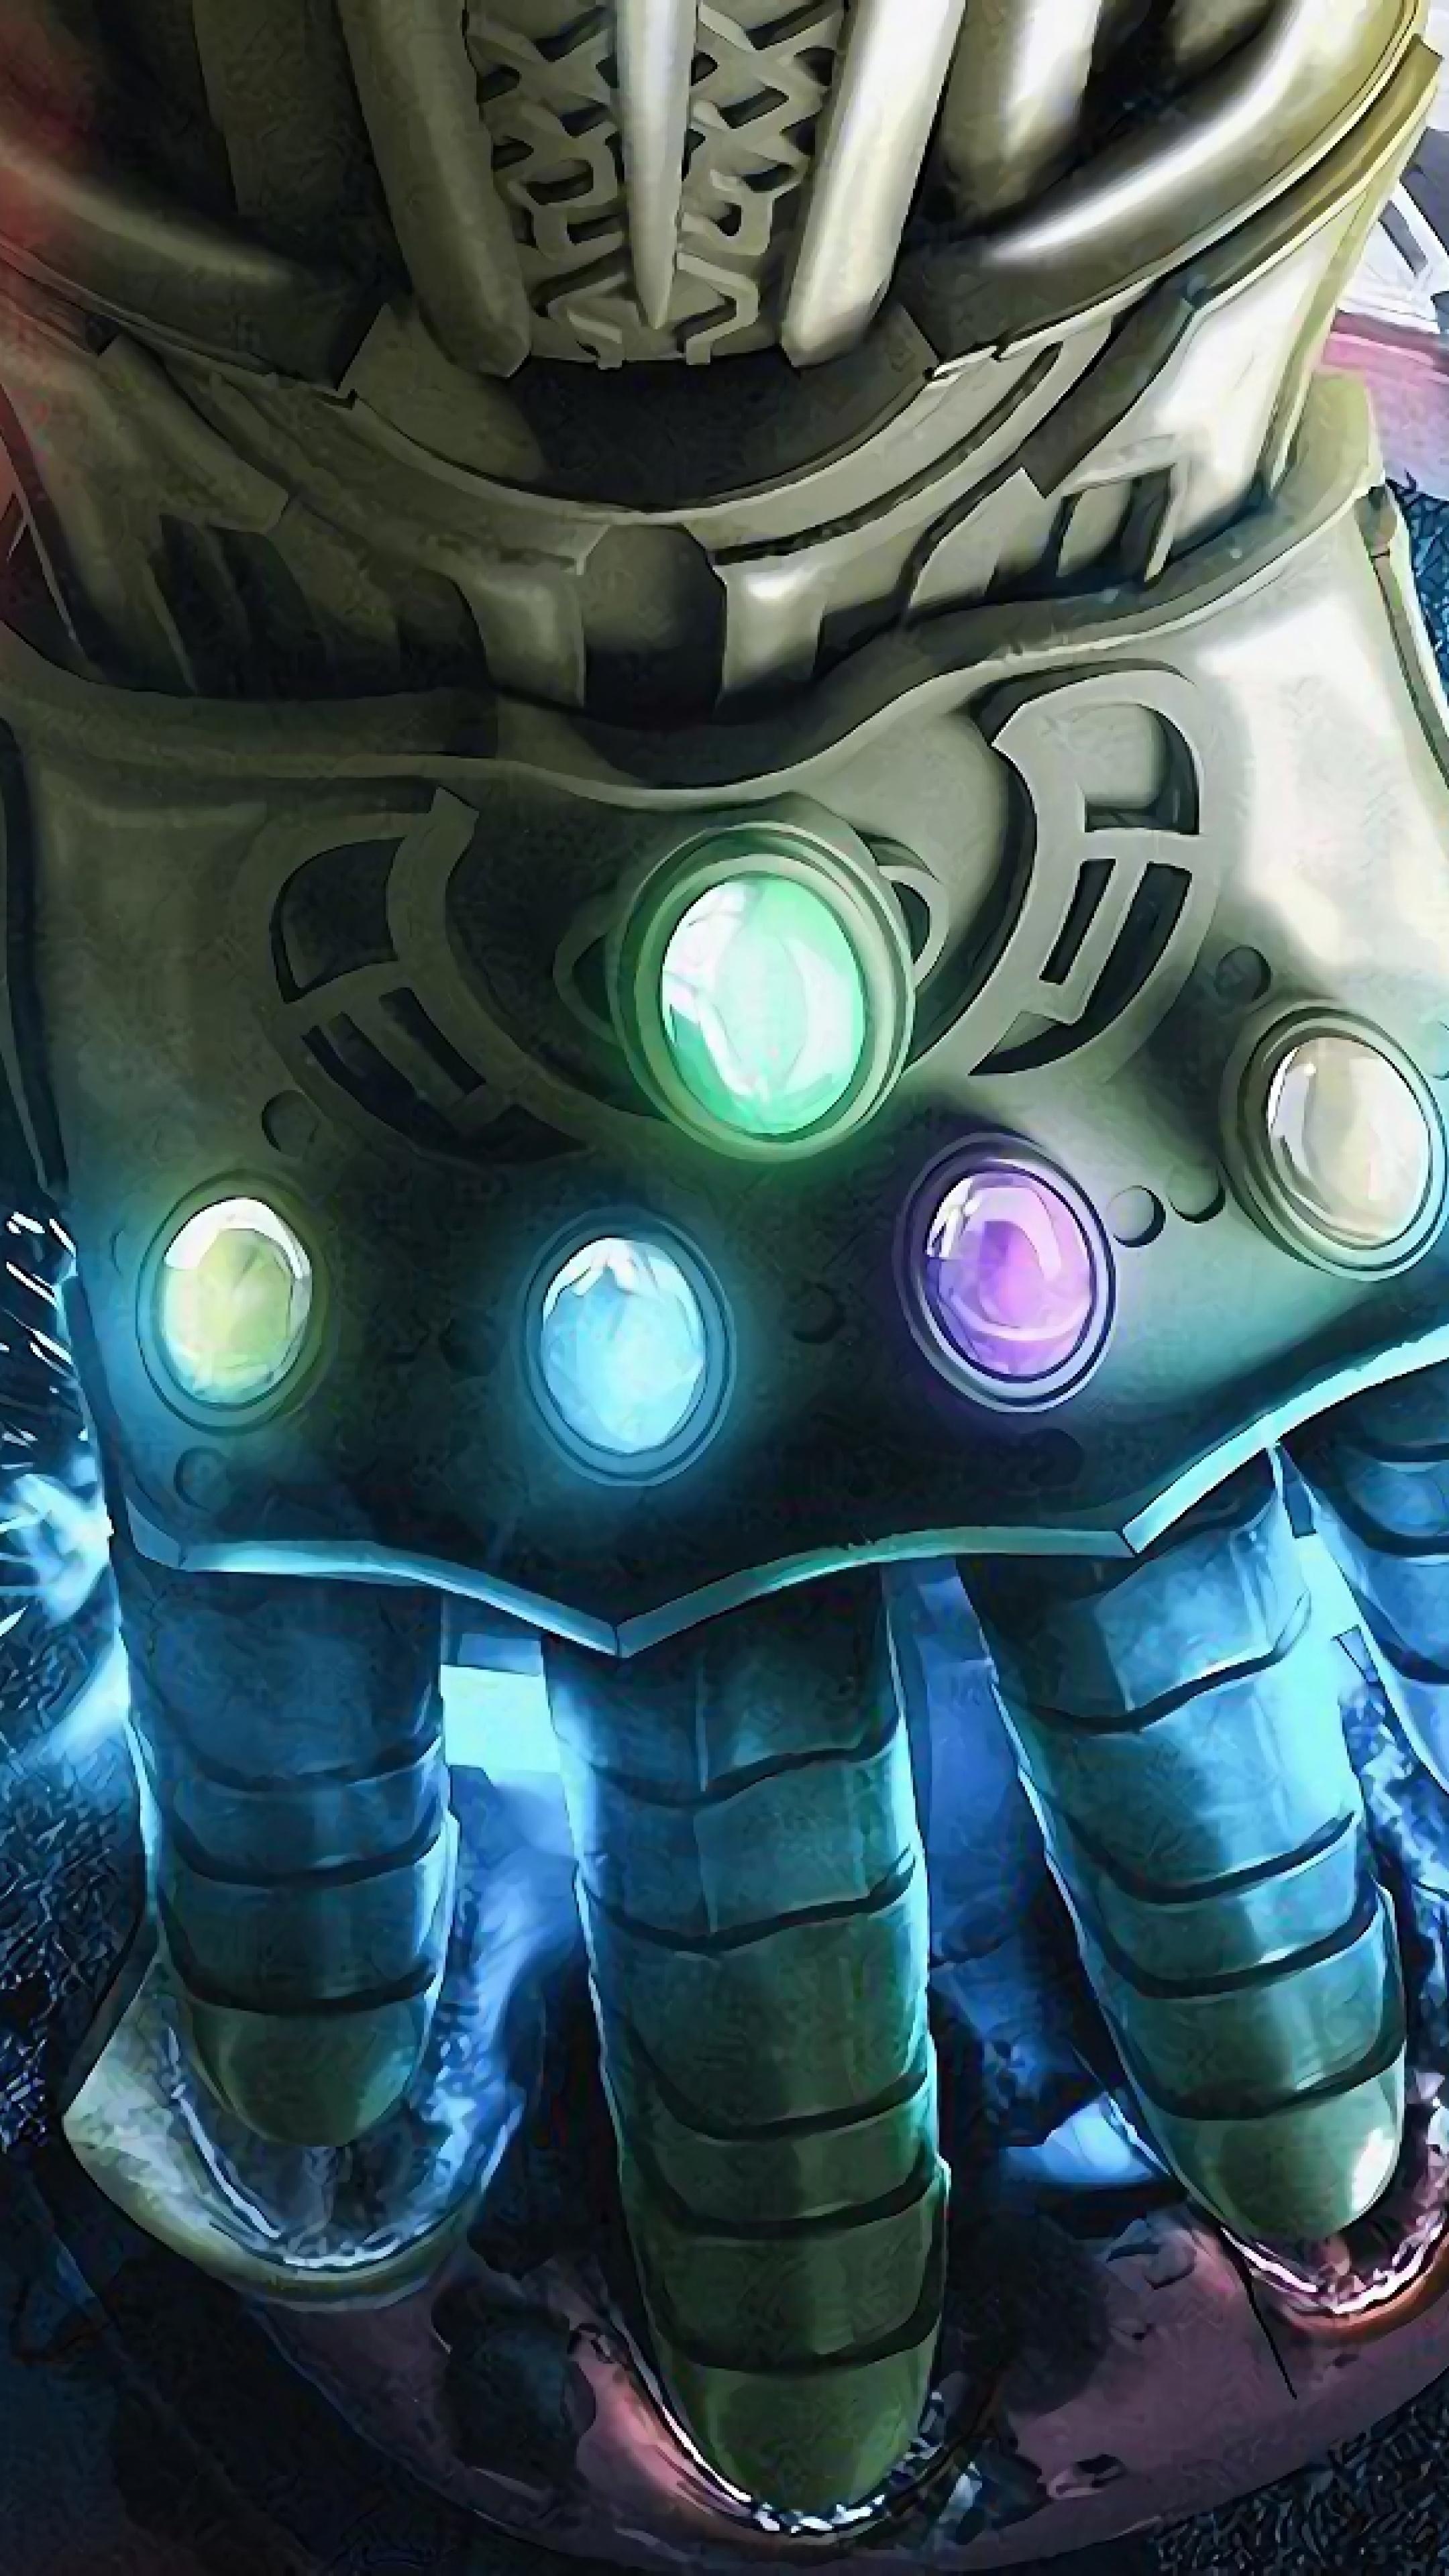 Infinity Gauntlet Of Thanos Avengers Infinity War 2018 Full Hd